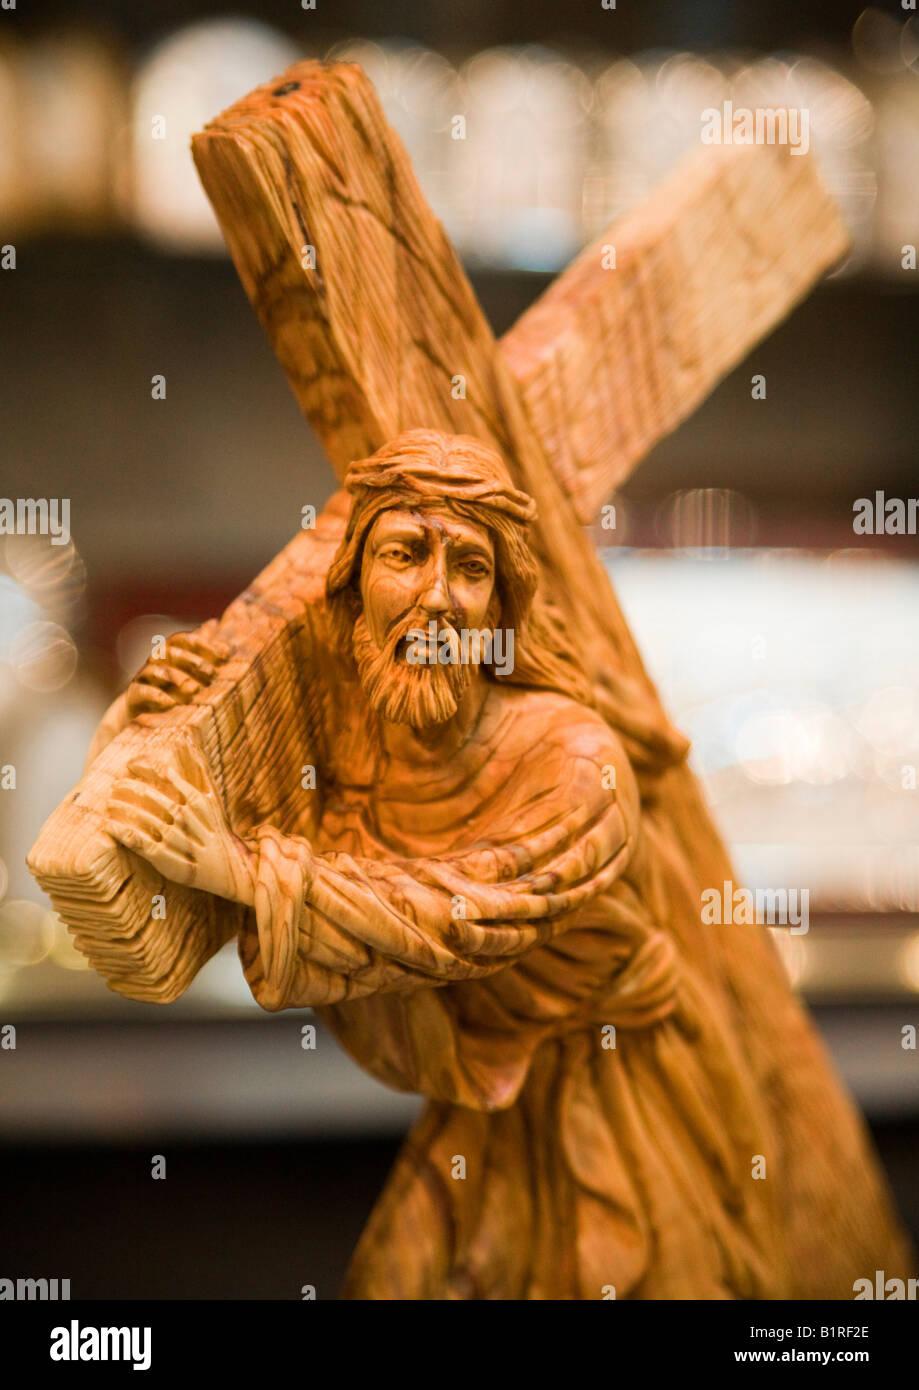 Wood carving of jesus carrying his cross bethlehem